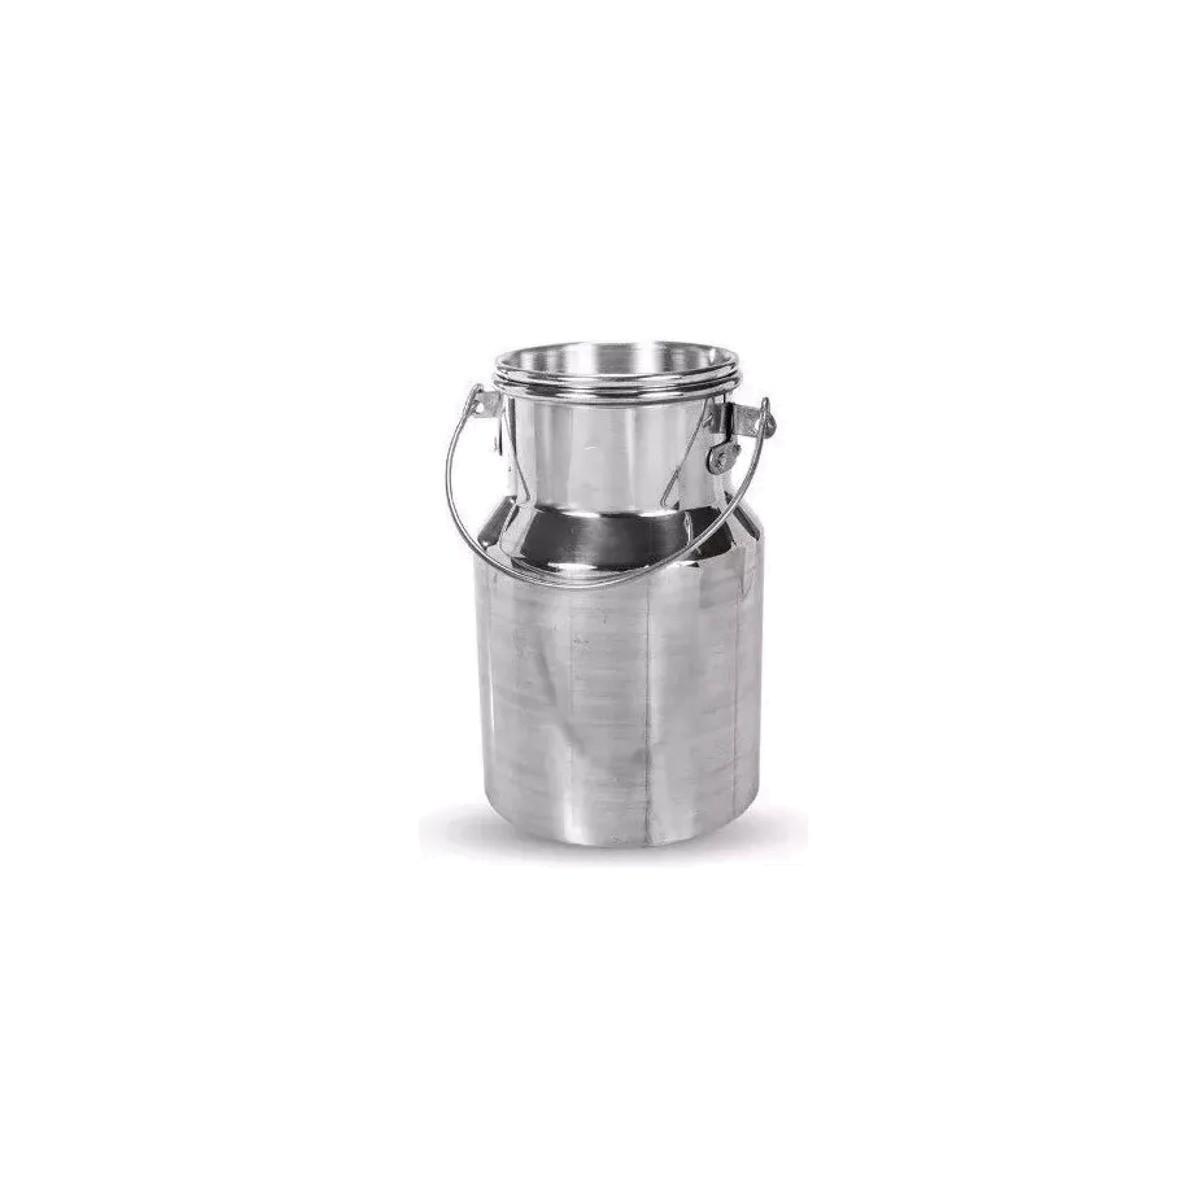 Depósito para Leite (leiteira) Continental - 5 Litros  - Panela de Ferro Fundido